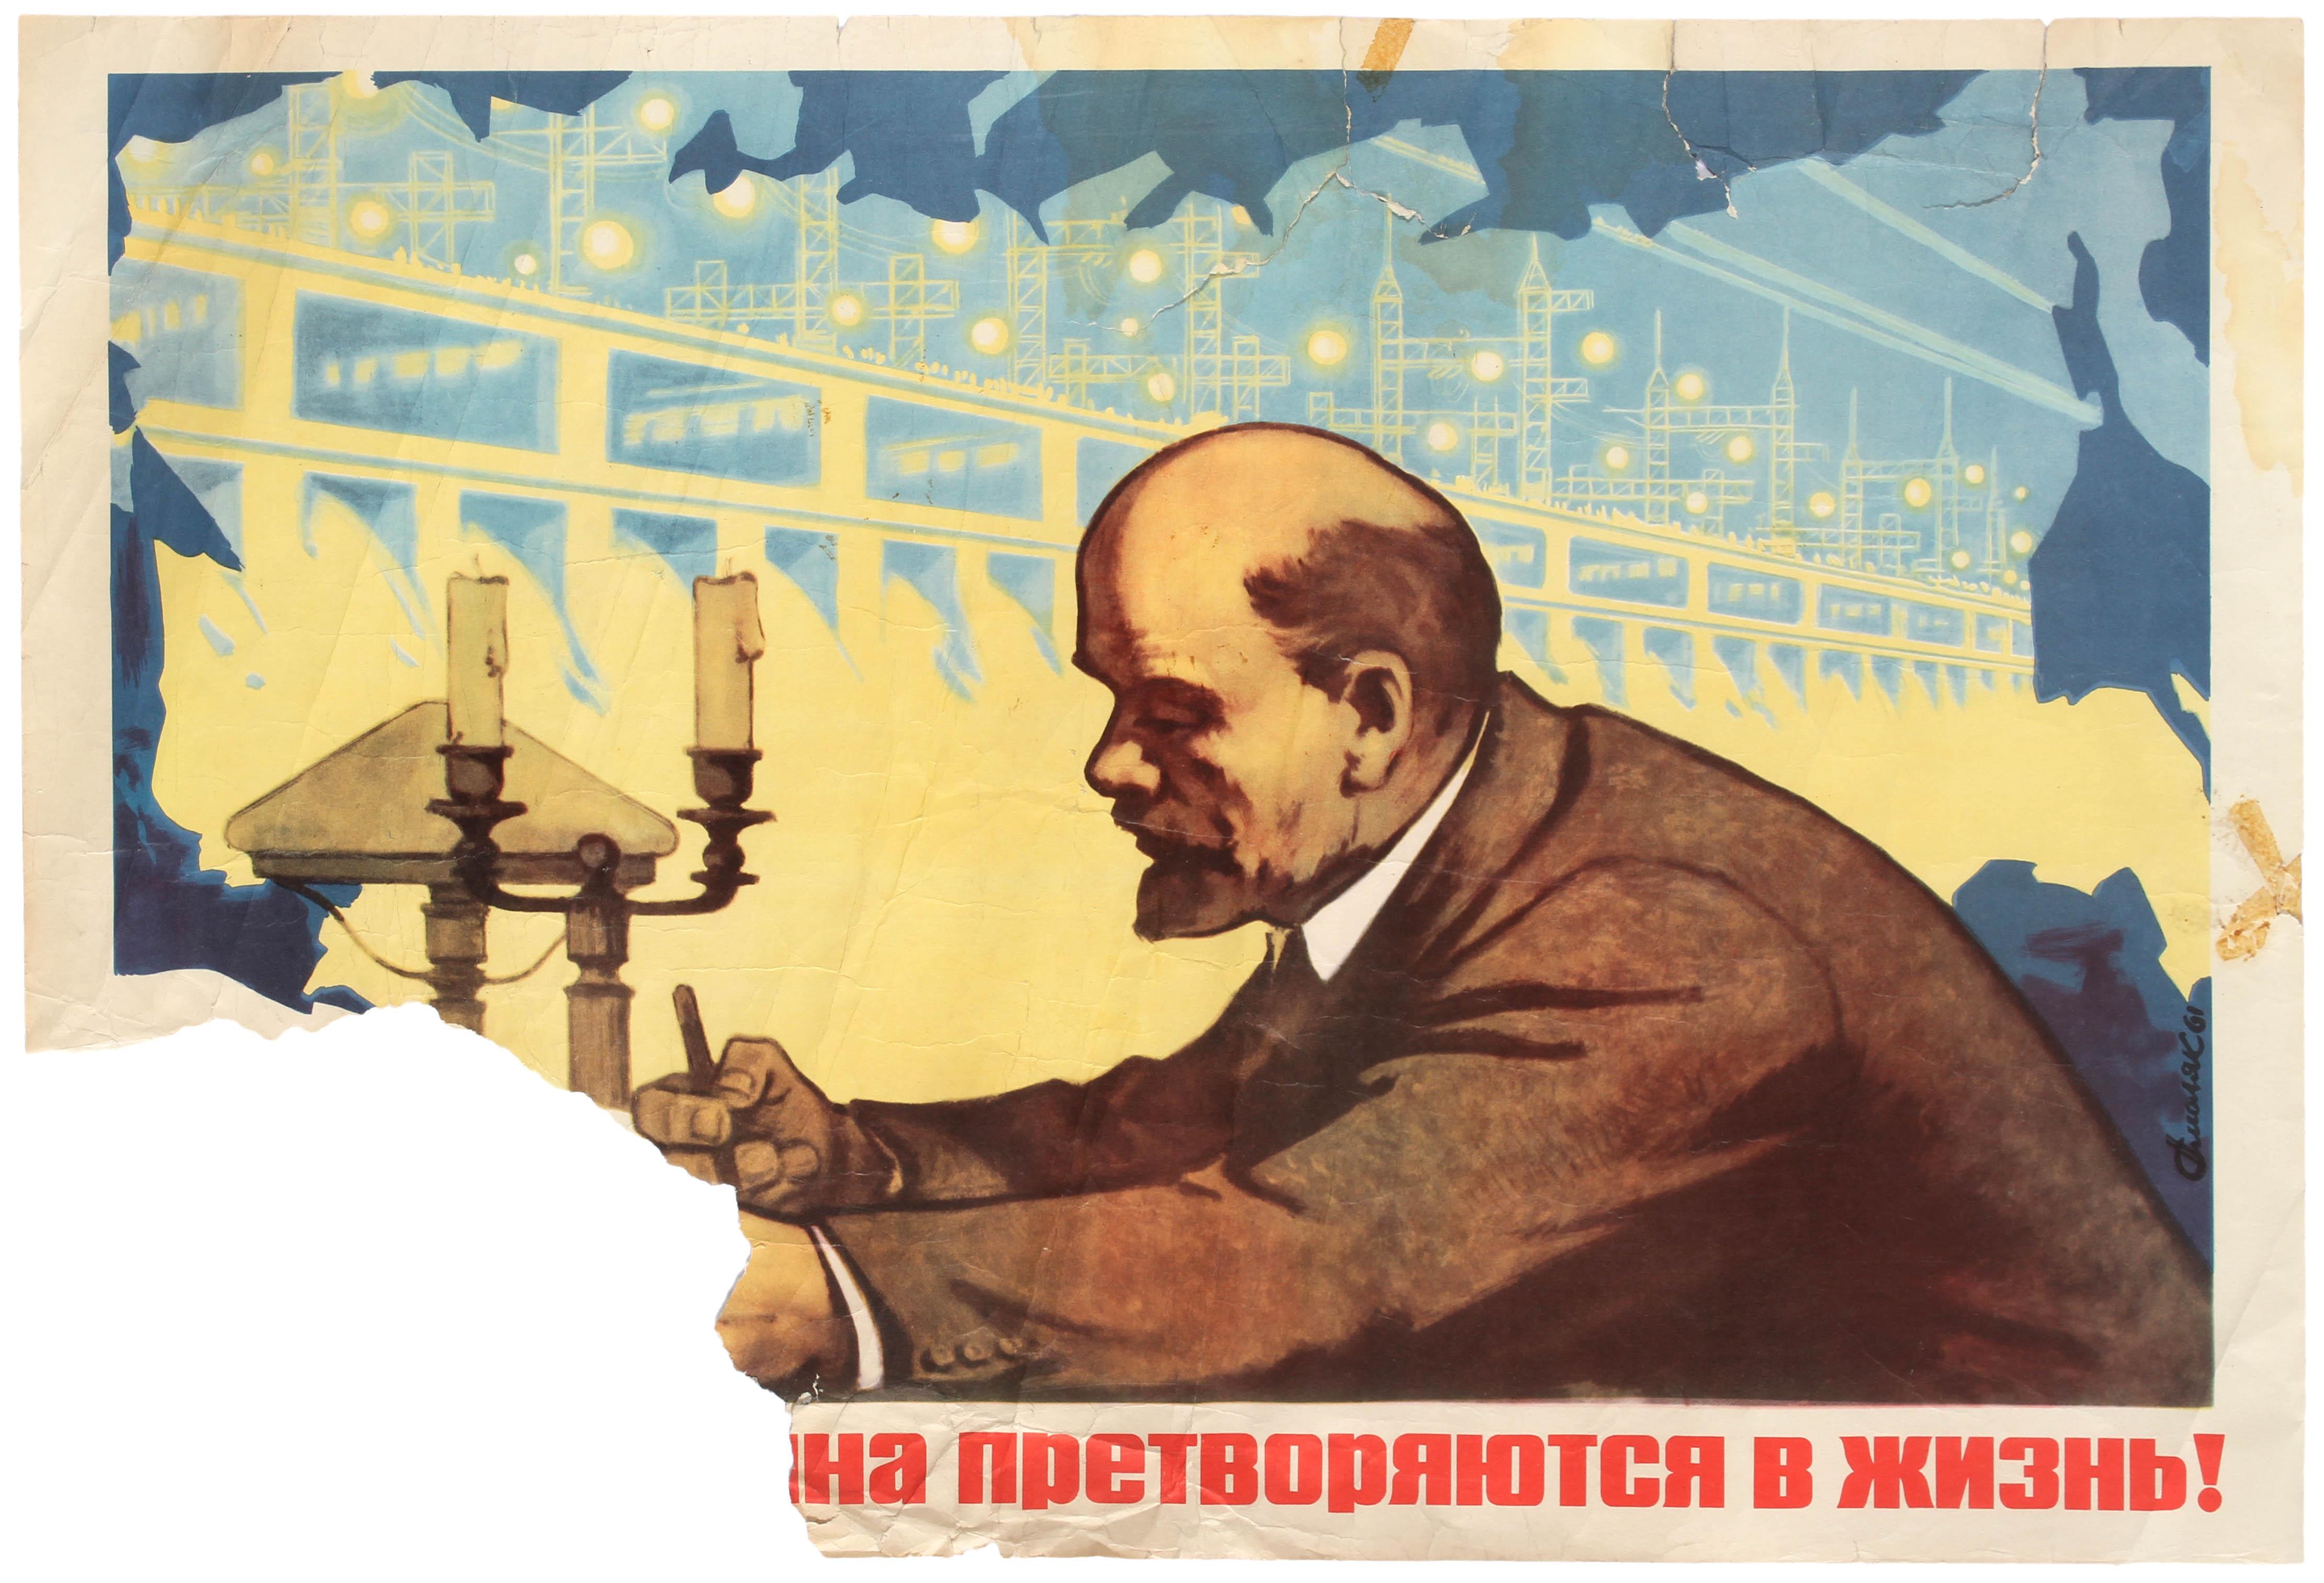 Lot 43 - Set 3 Propaganda Posters USSR Lenin Comminism Electrification